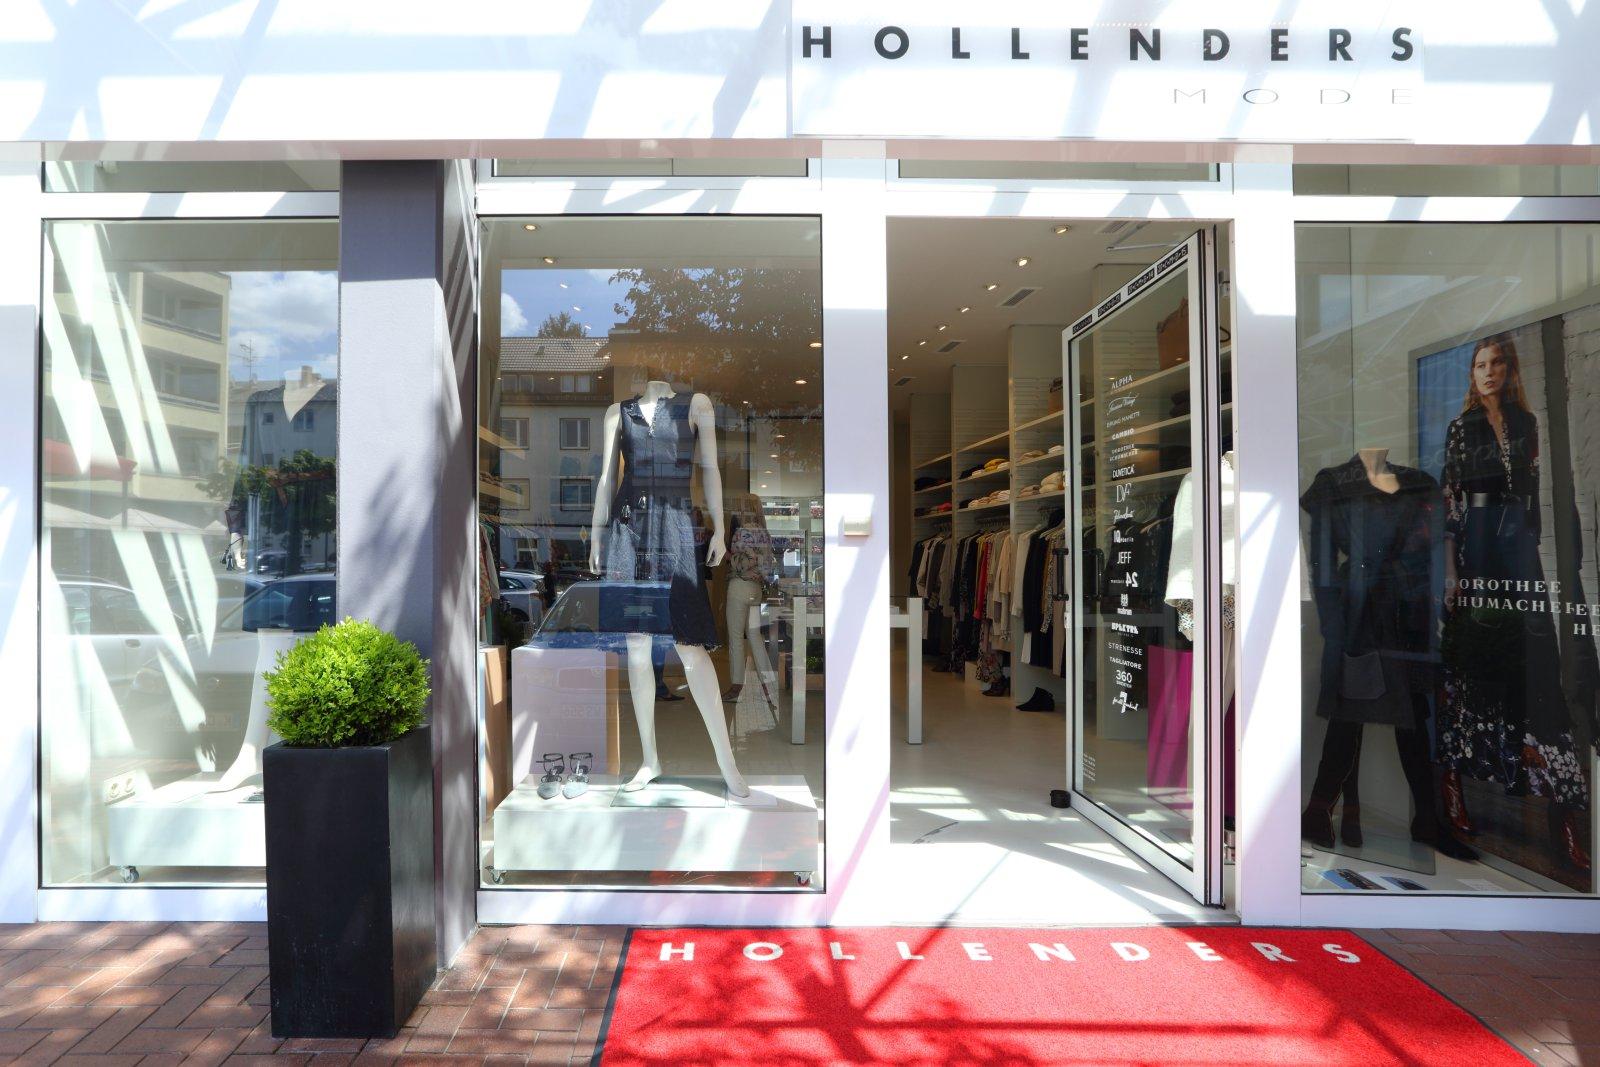 hollenders-auswahl-hires-0023